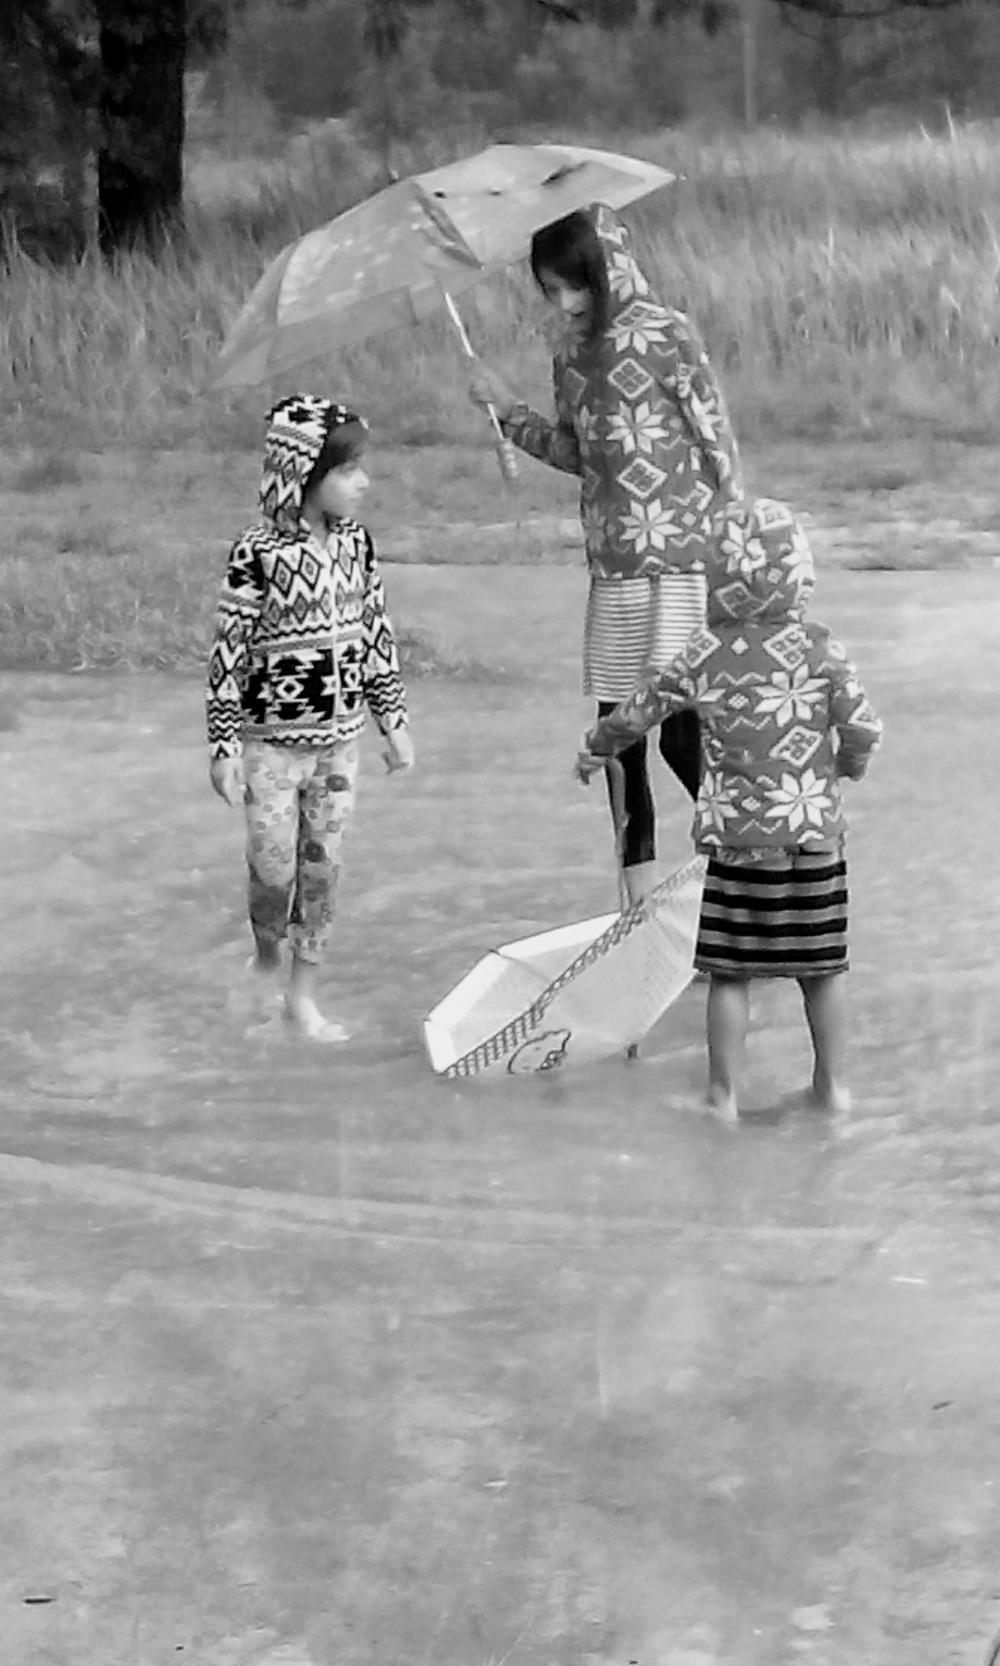 Rain Play II